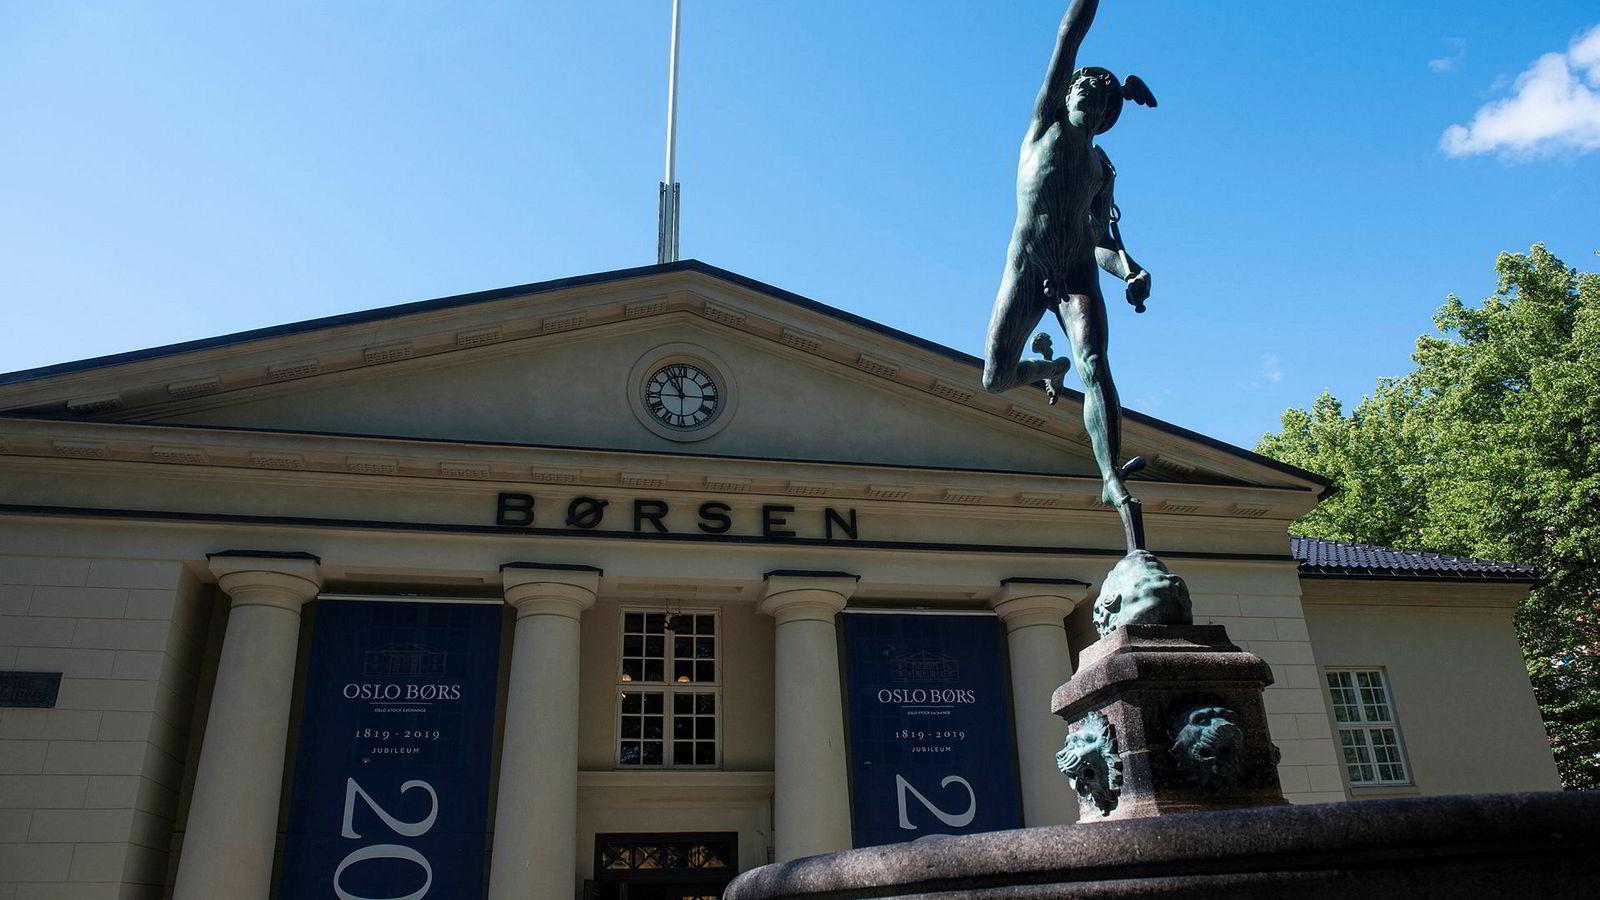 Børsbygningen, Oslo.